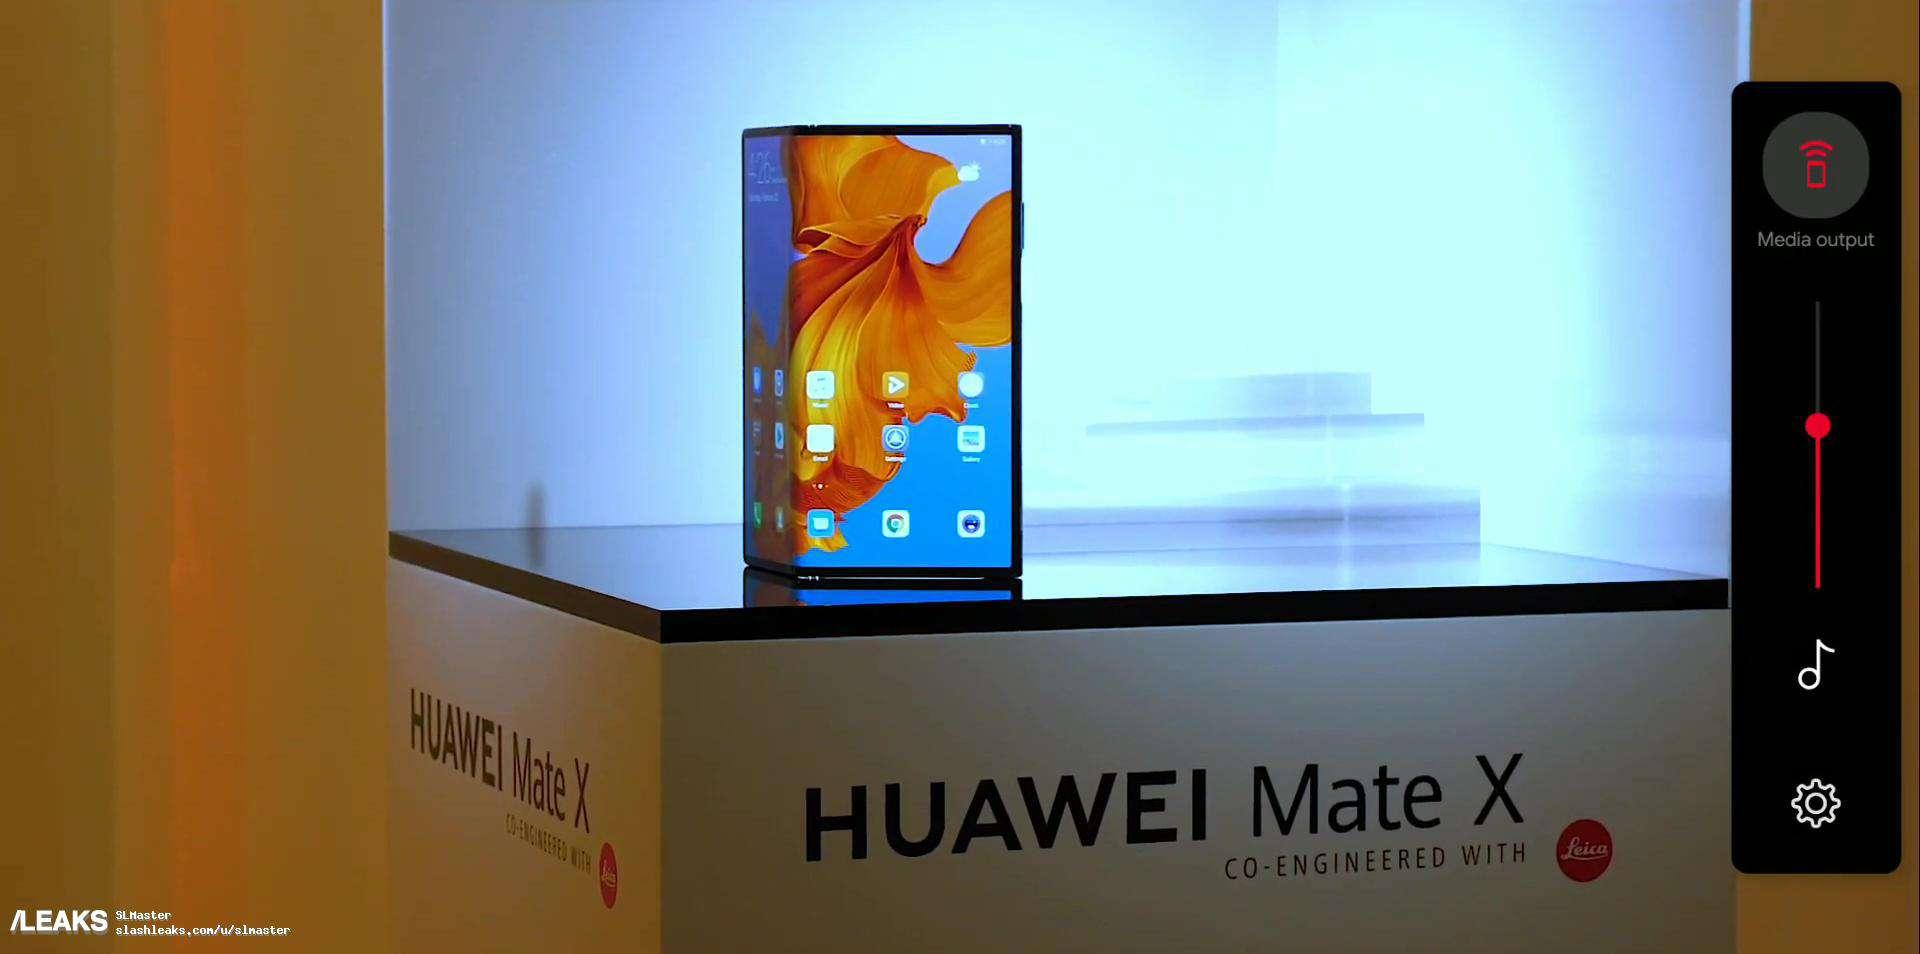 Huawei Mate X real life image leak 1